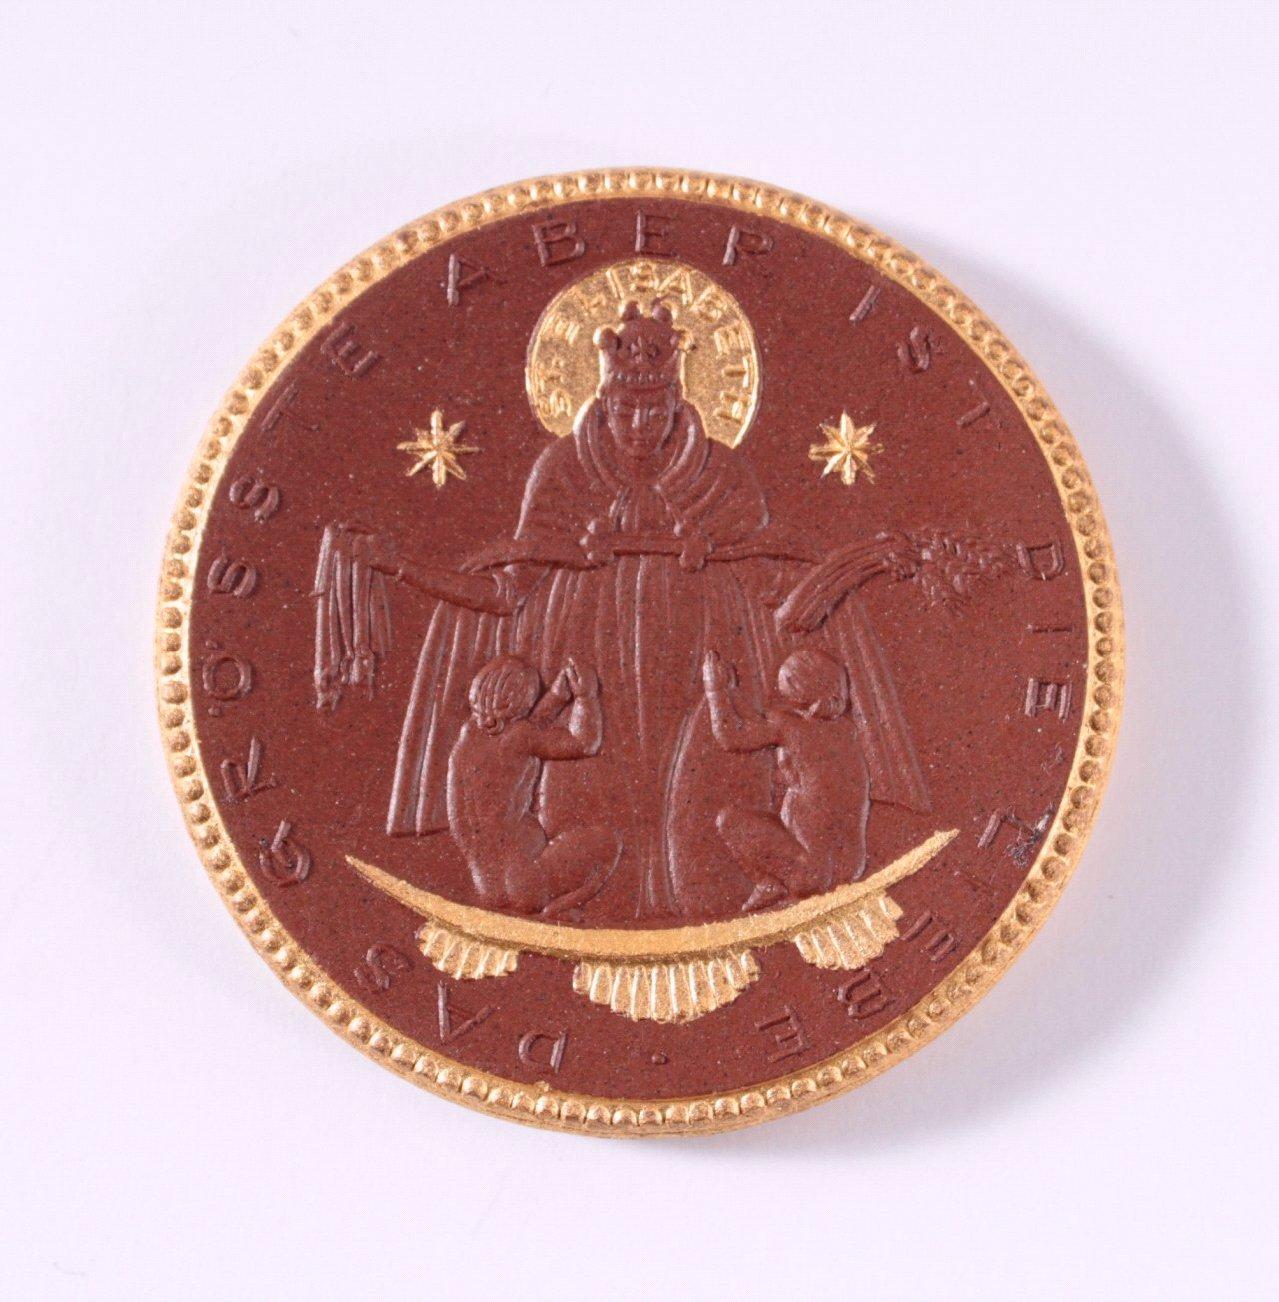 Böttger Steinzeug Medaille Caritas Verband 1924